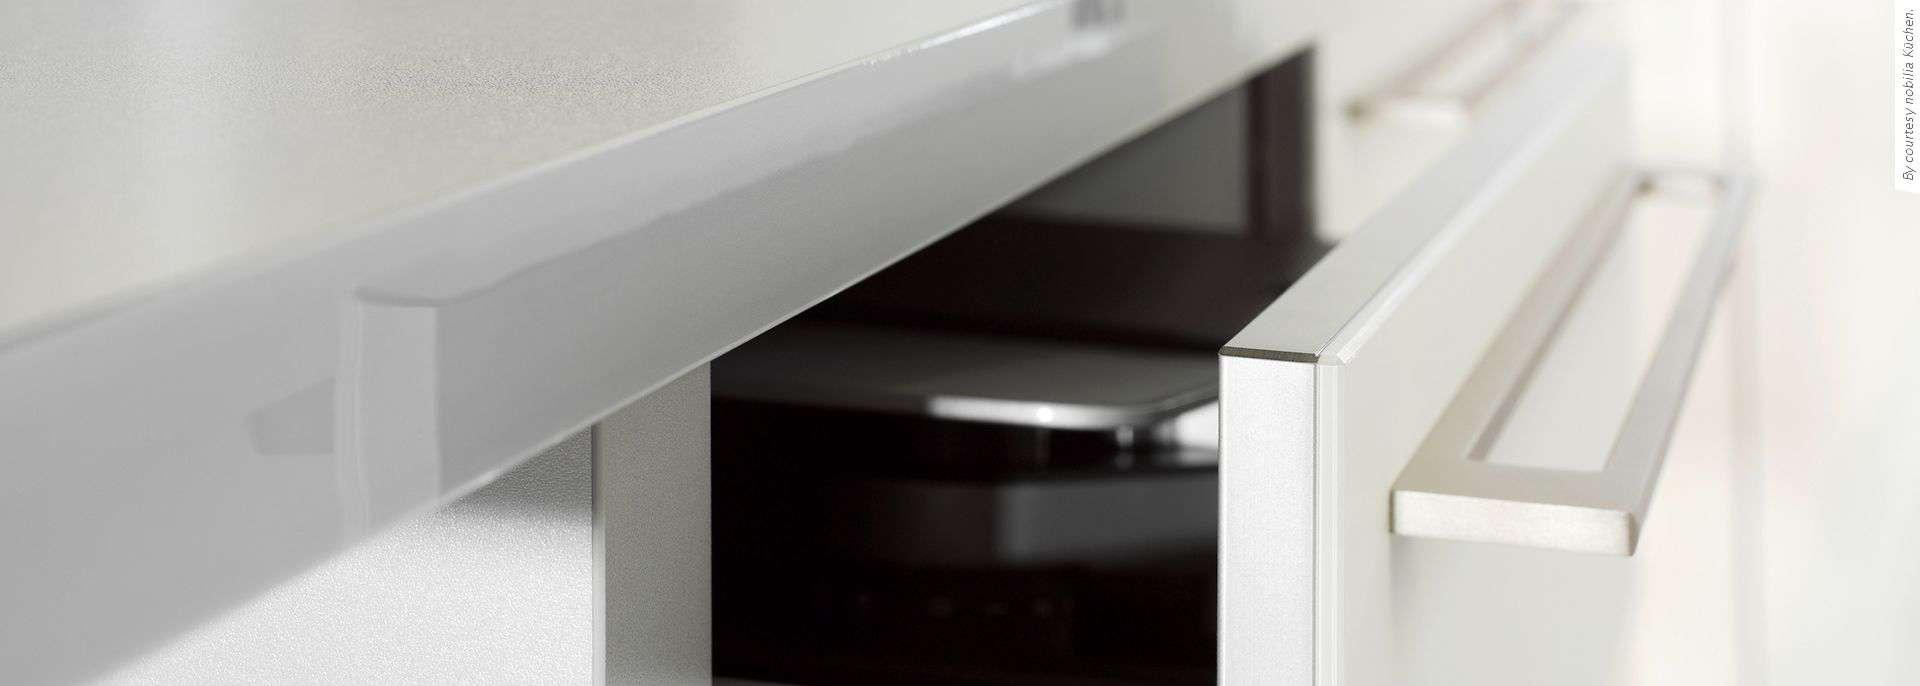 REHAU RAUKANTEX edgebanding solution for drawer edgebander